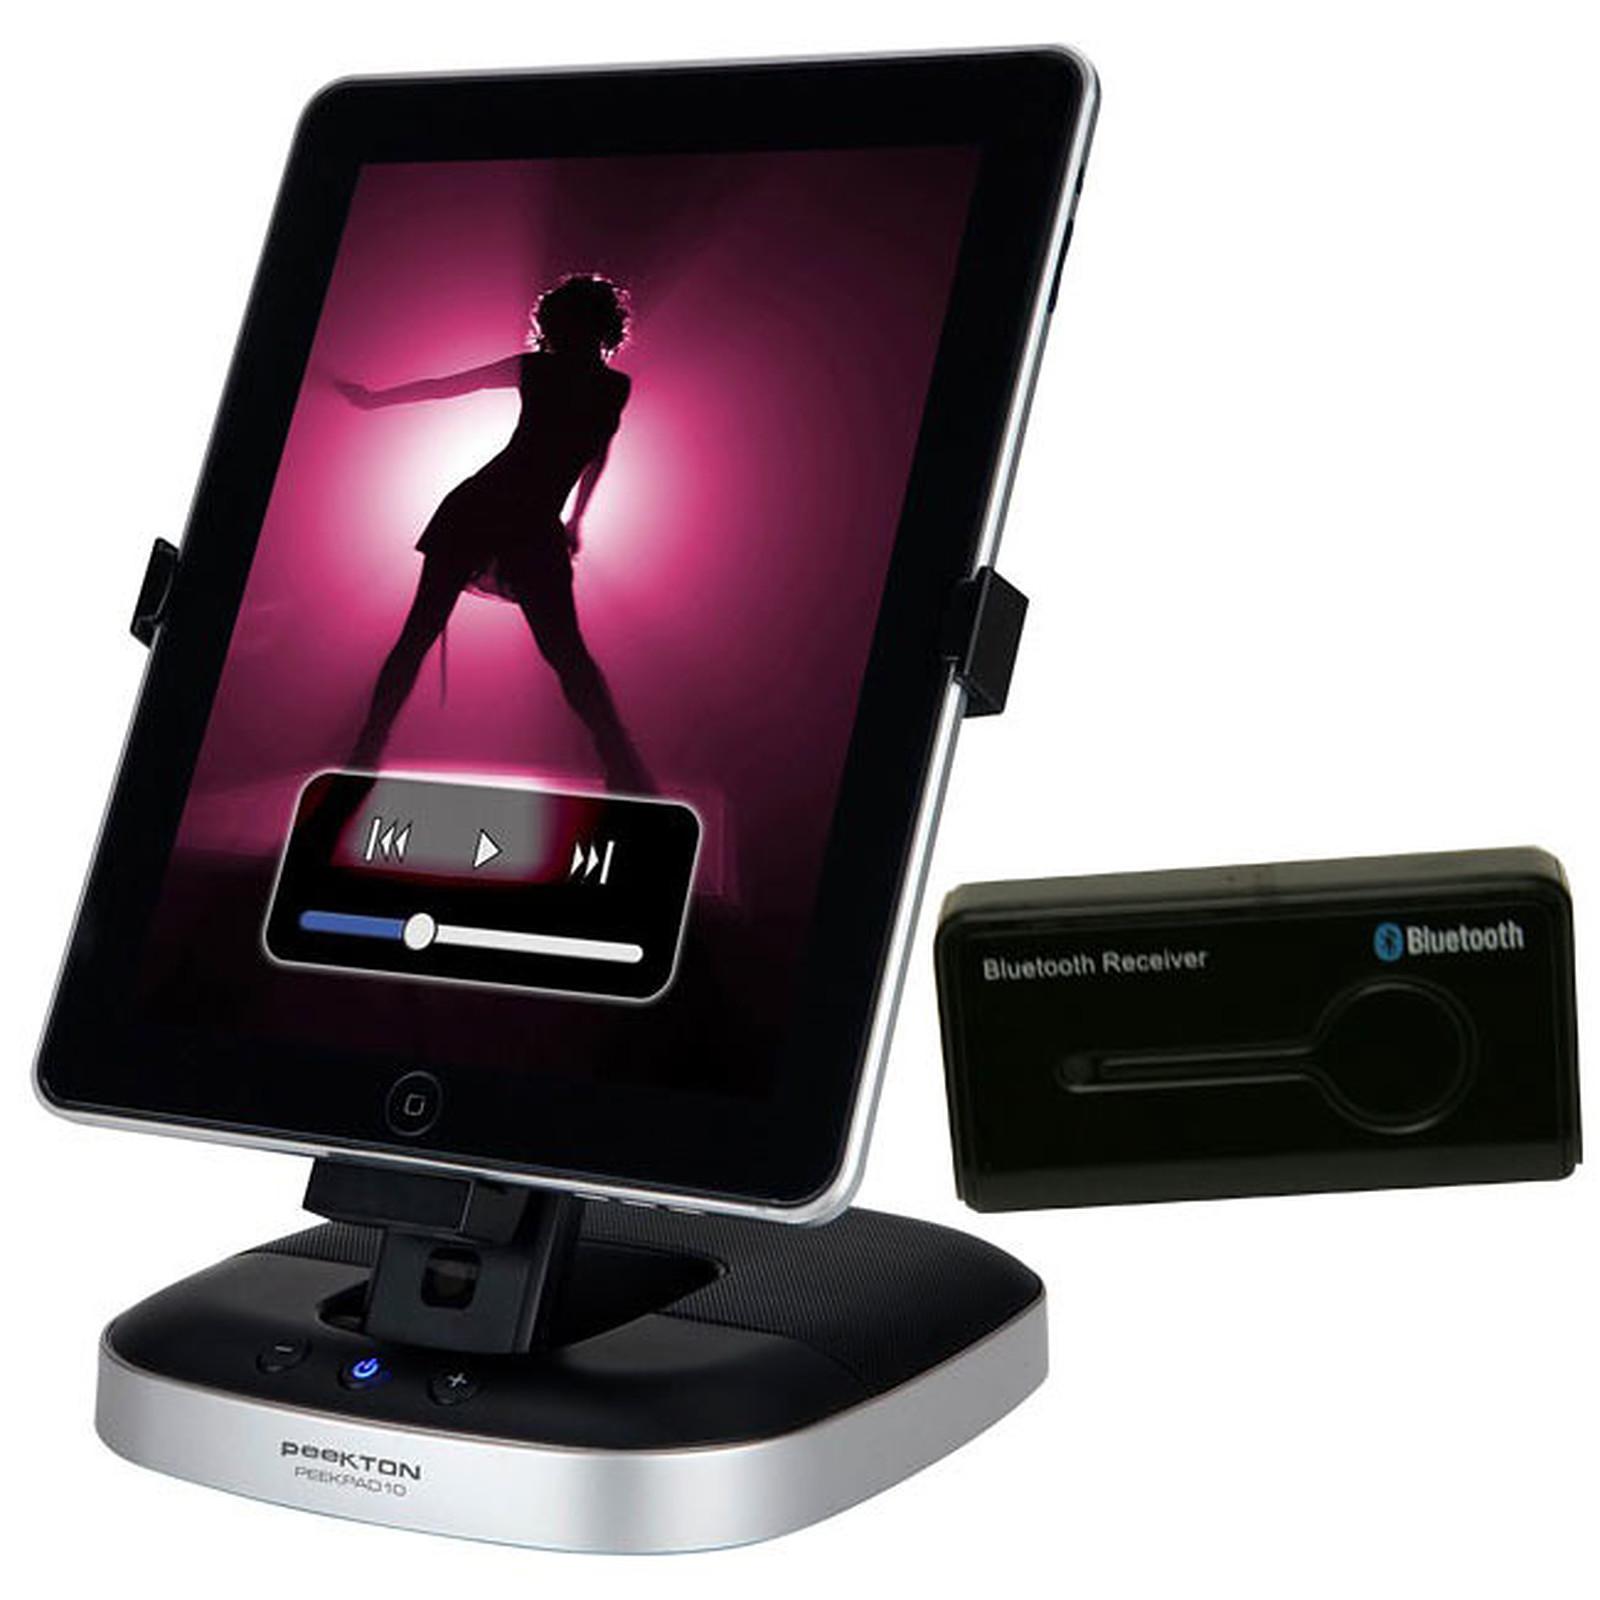 PeeKTON PeekPad 10 + Neo Sound Récepteur Bluetooth